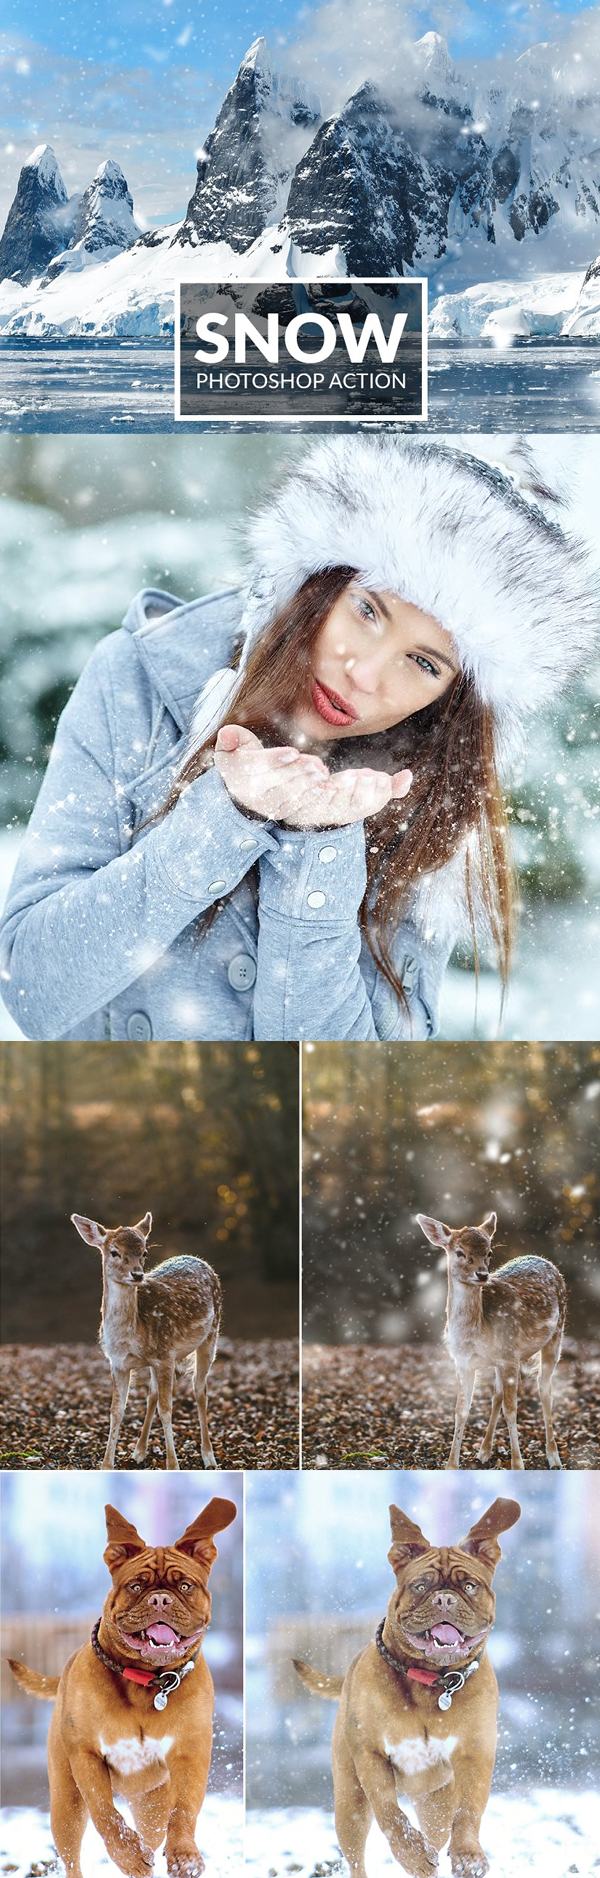 Realistic Snow Photoshop Action